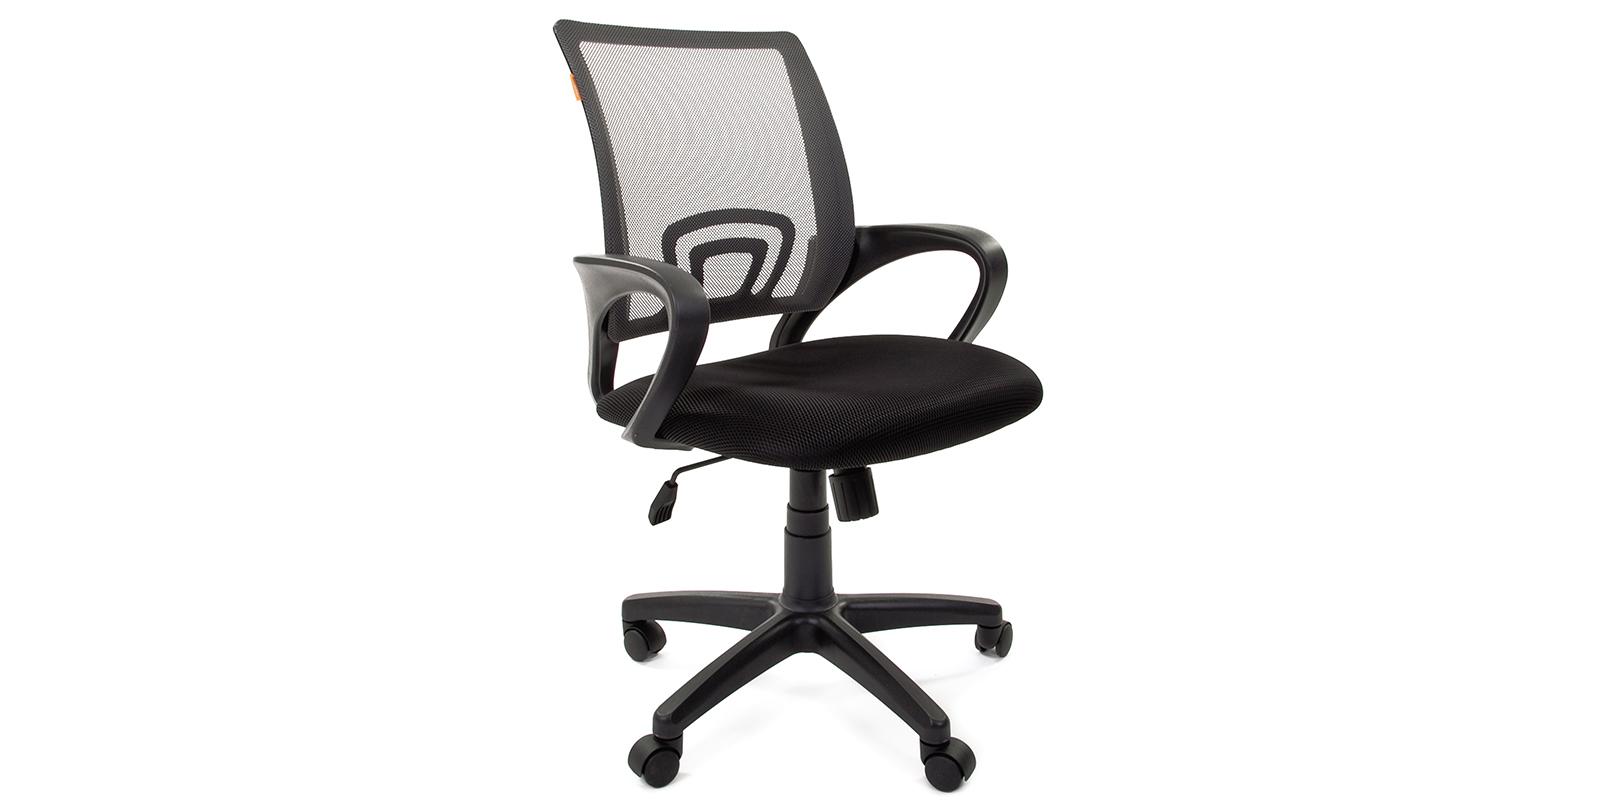 Chairman 696 (черный/серый)